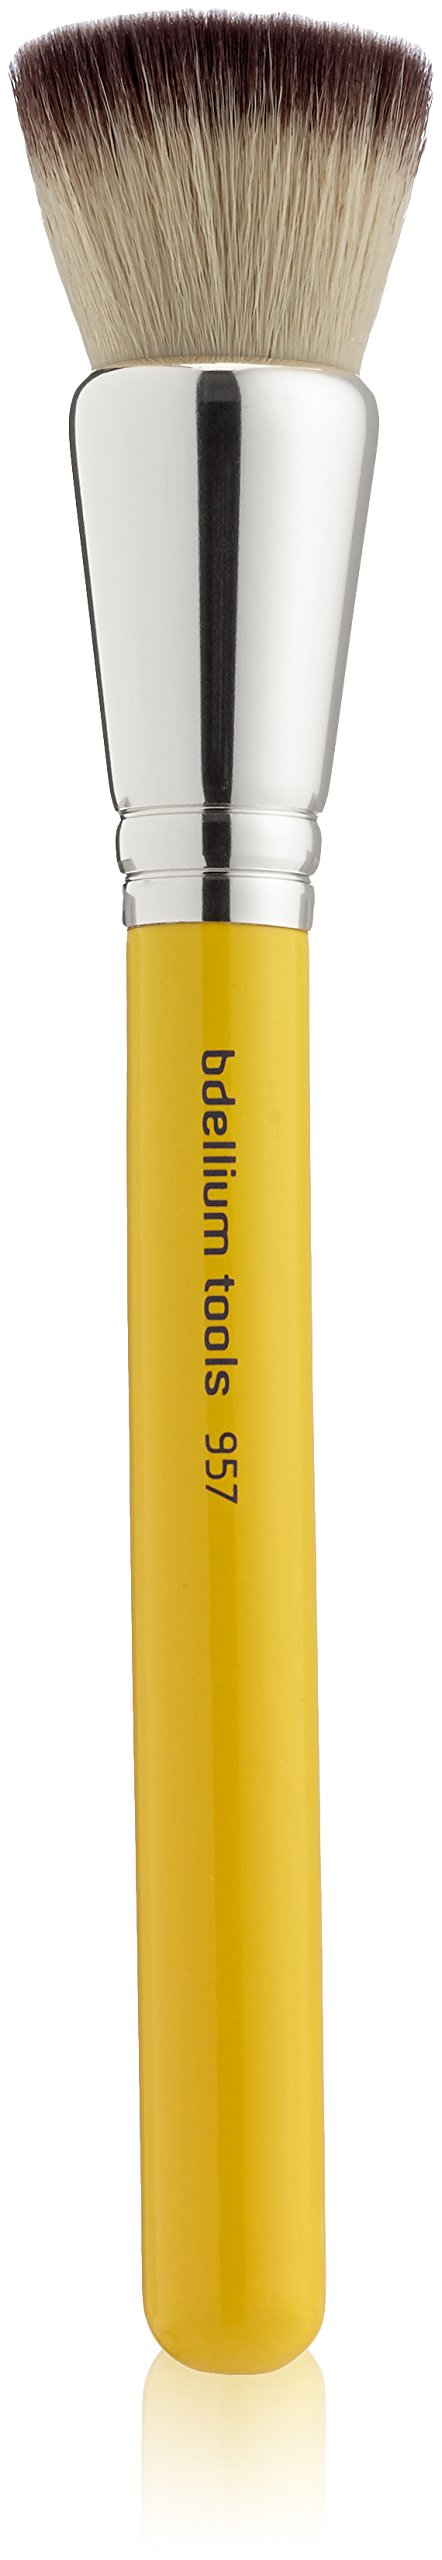 Bdellium Tools Professional Makeup Brush Studio Line - Precision Kabuki Airbrushed Effect 957